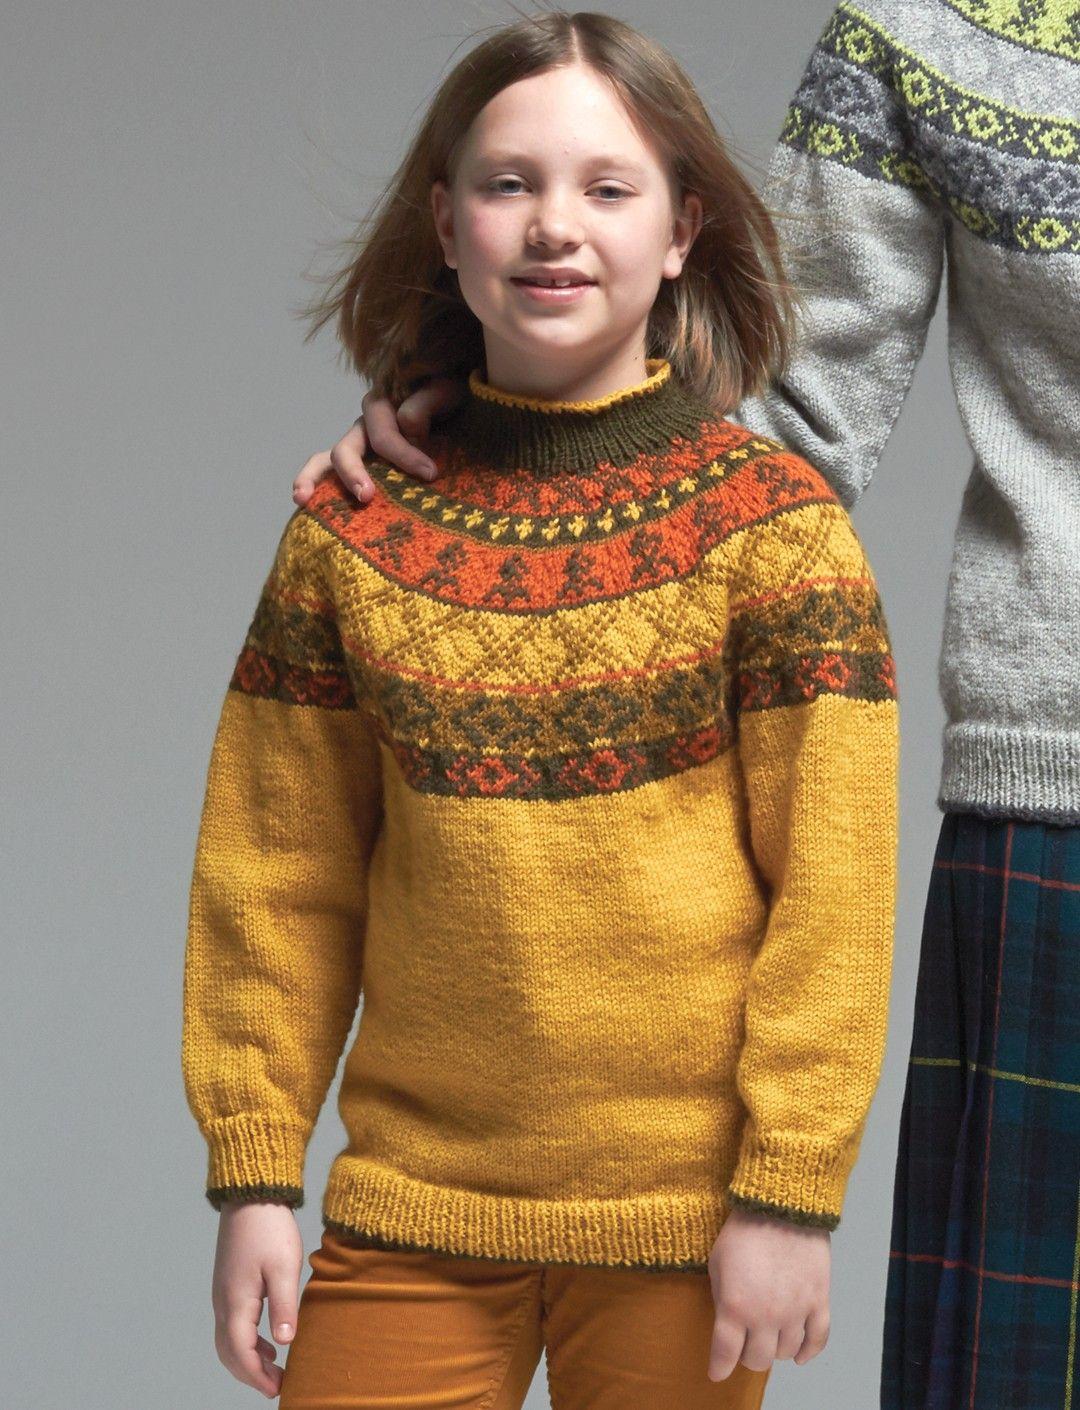 Yarnspirations patons childs sunny yoke sweater patterns yarnspirations patons childs sunny yoke sweater patterns yarnspirations bankloansurffo Images